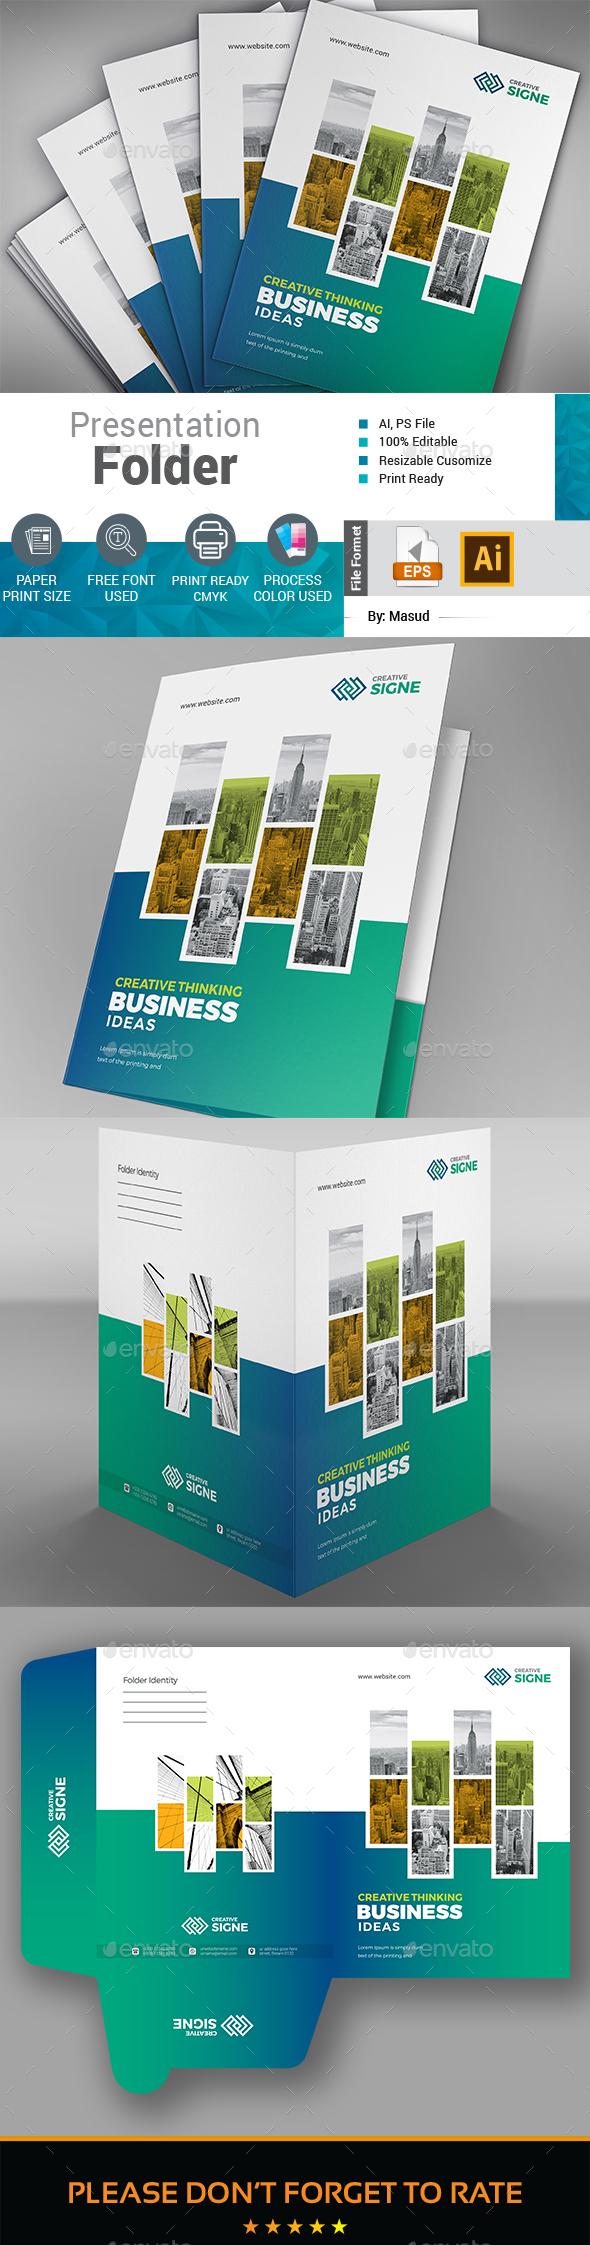 Business Presentation Folder - Stationery Print Templates